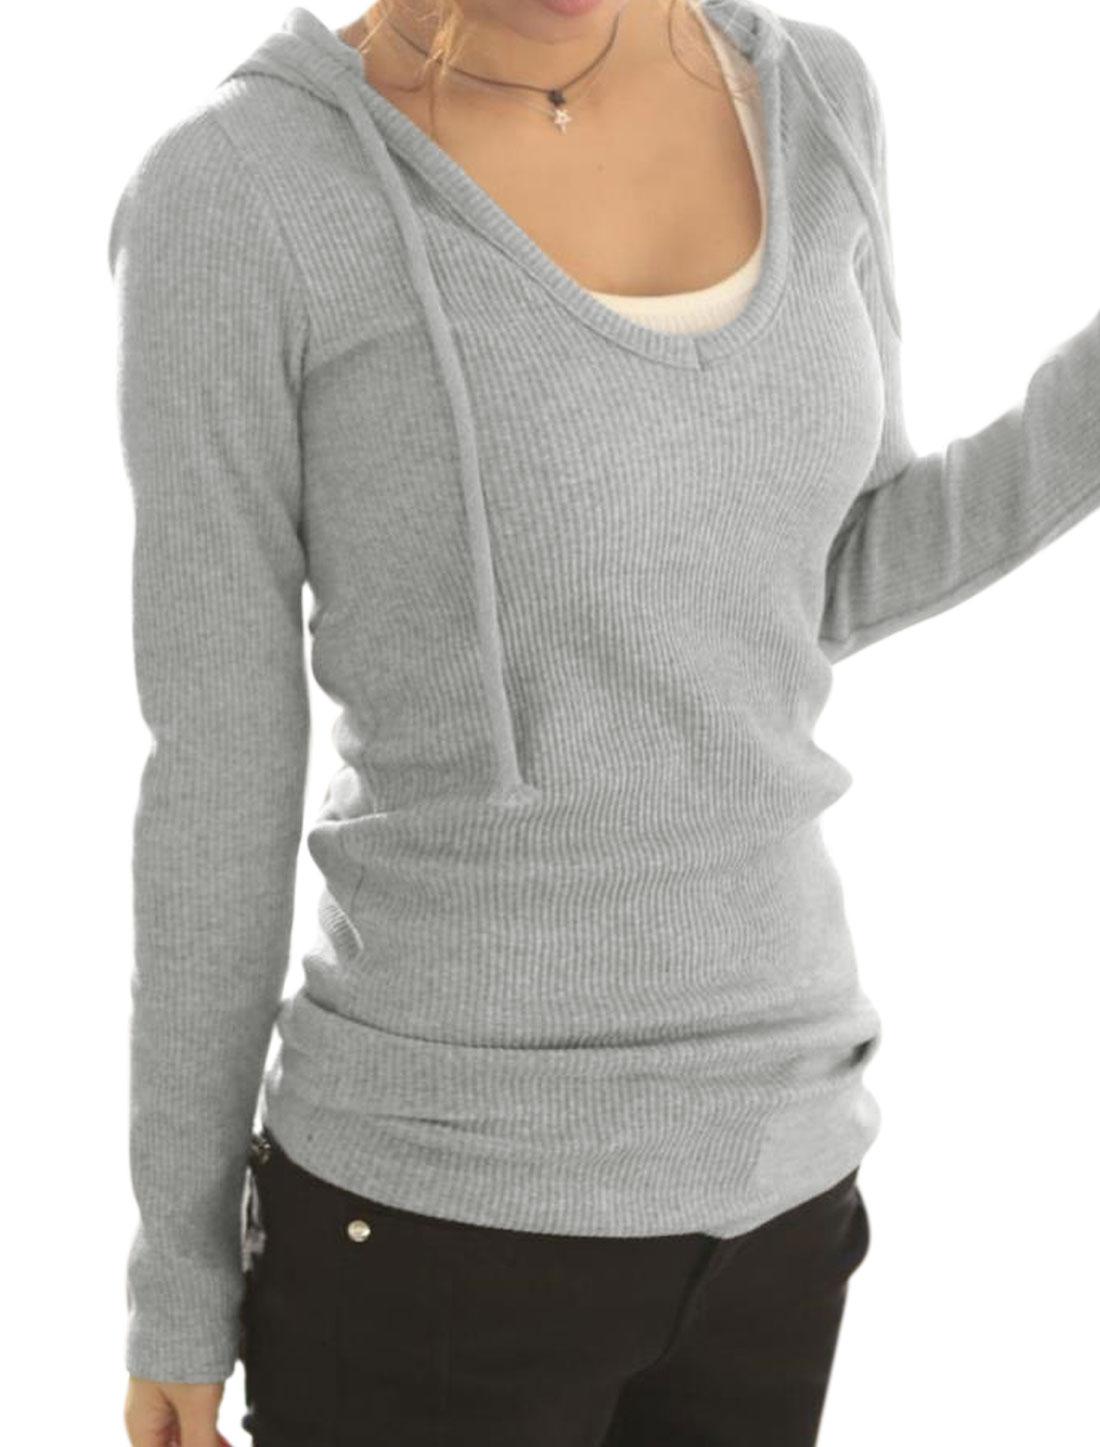 Ladies Light Gray Drawstring Slim Fit Leisure Hoodie Sweatshirt XS